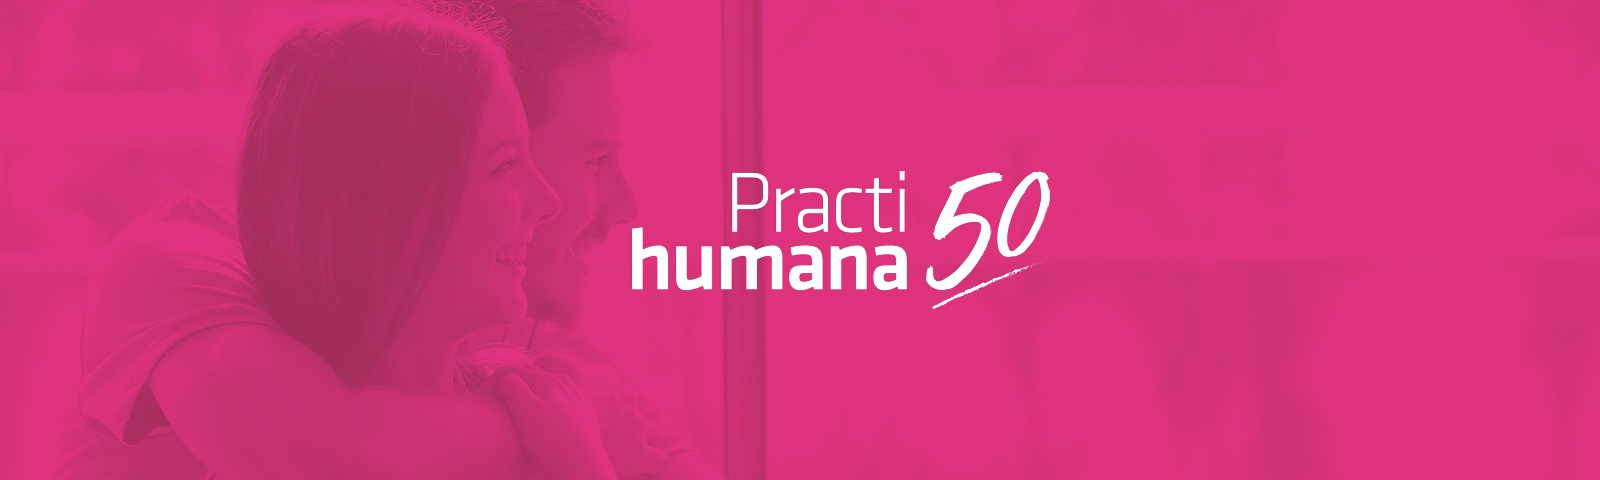 Practihumana50